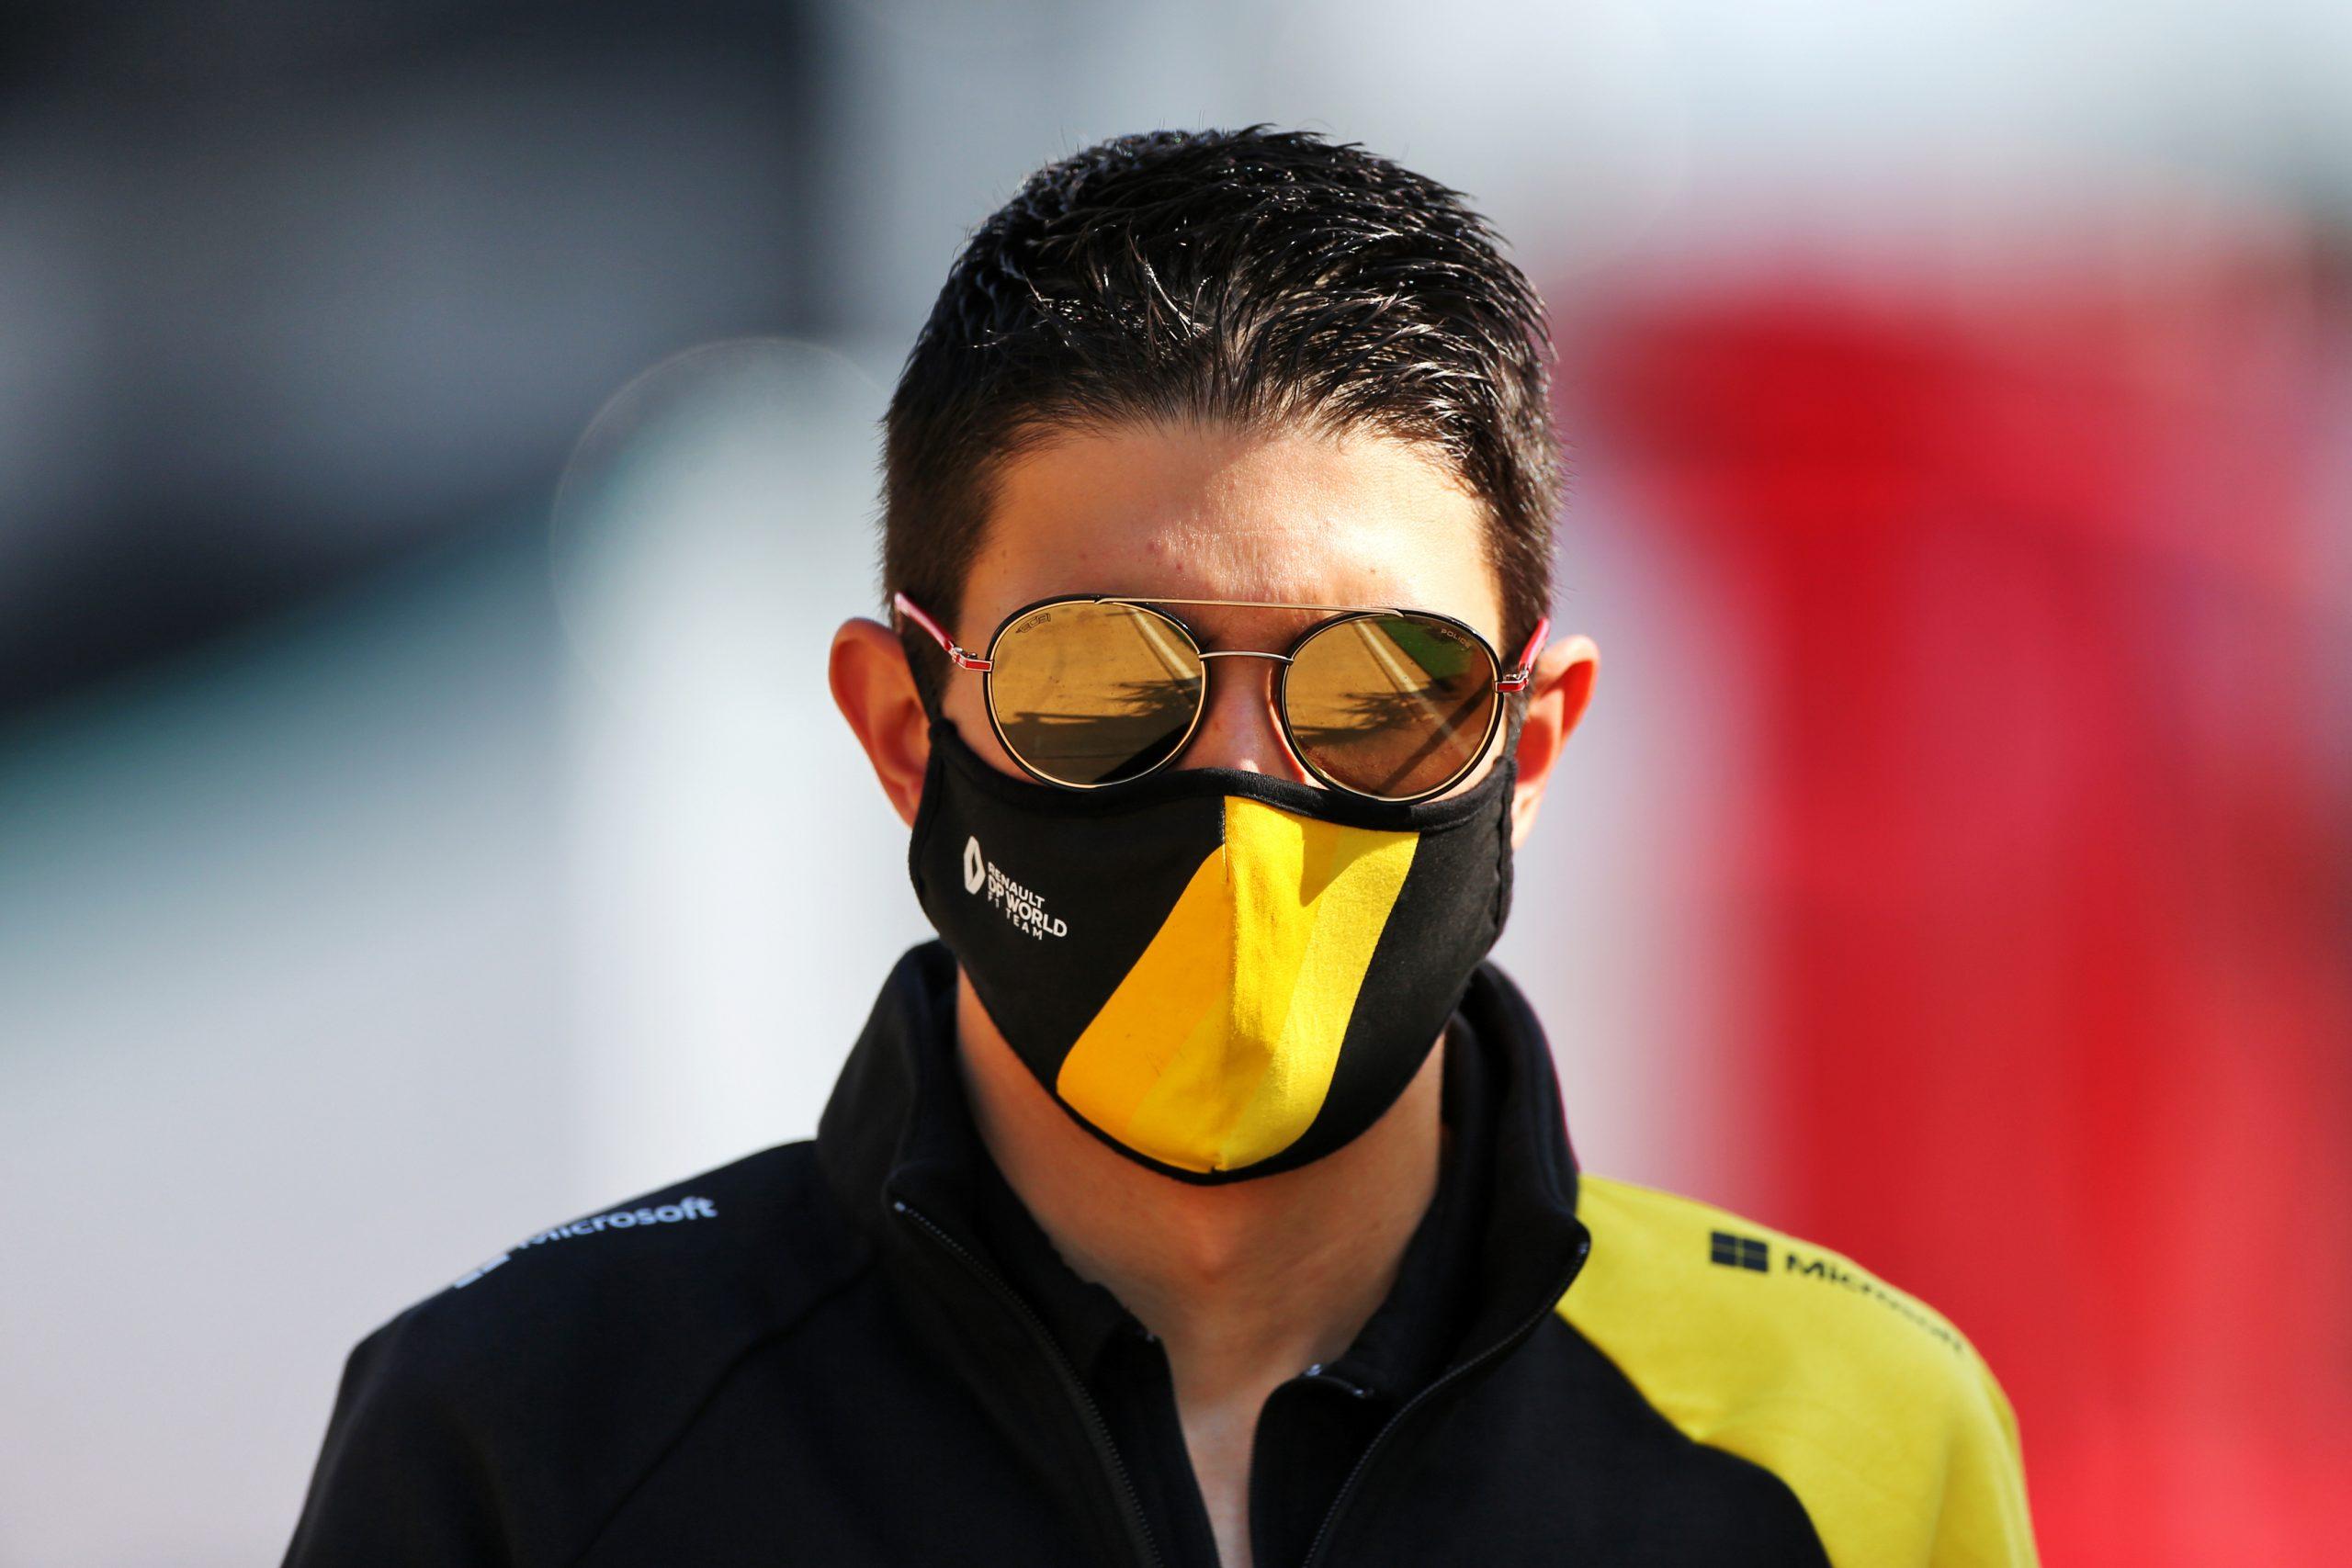 F1 - Esteban Ocon ou Valtteri Bottas, Mercedes face à un vrai dilemme